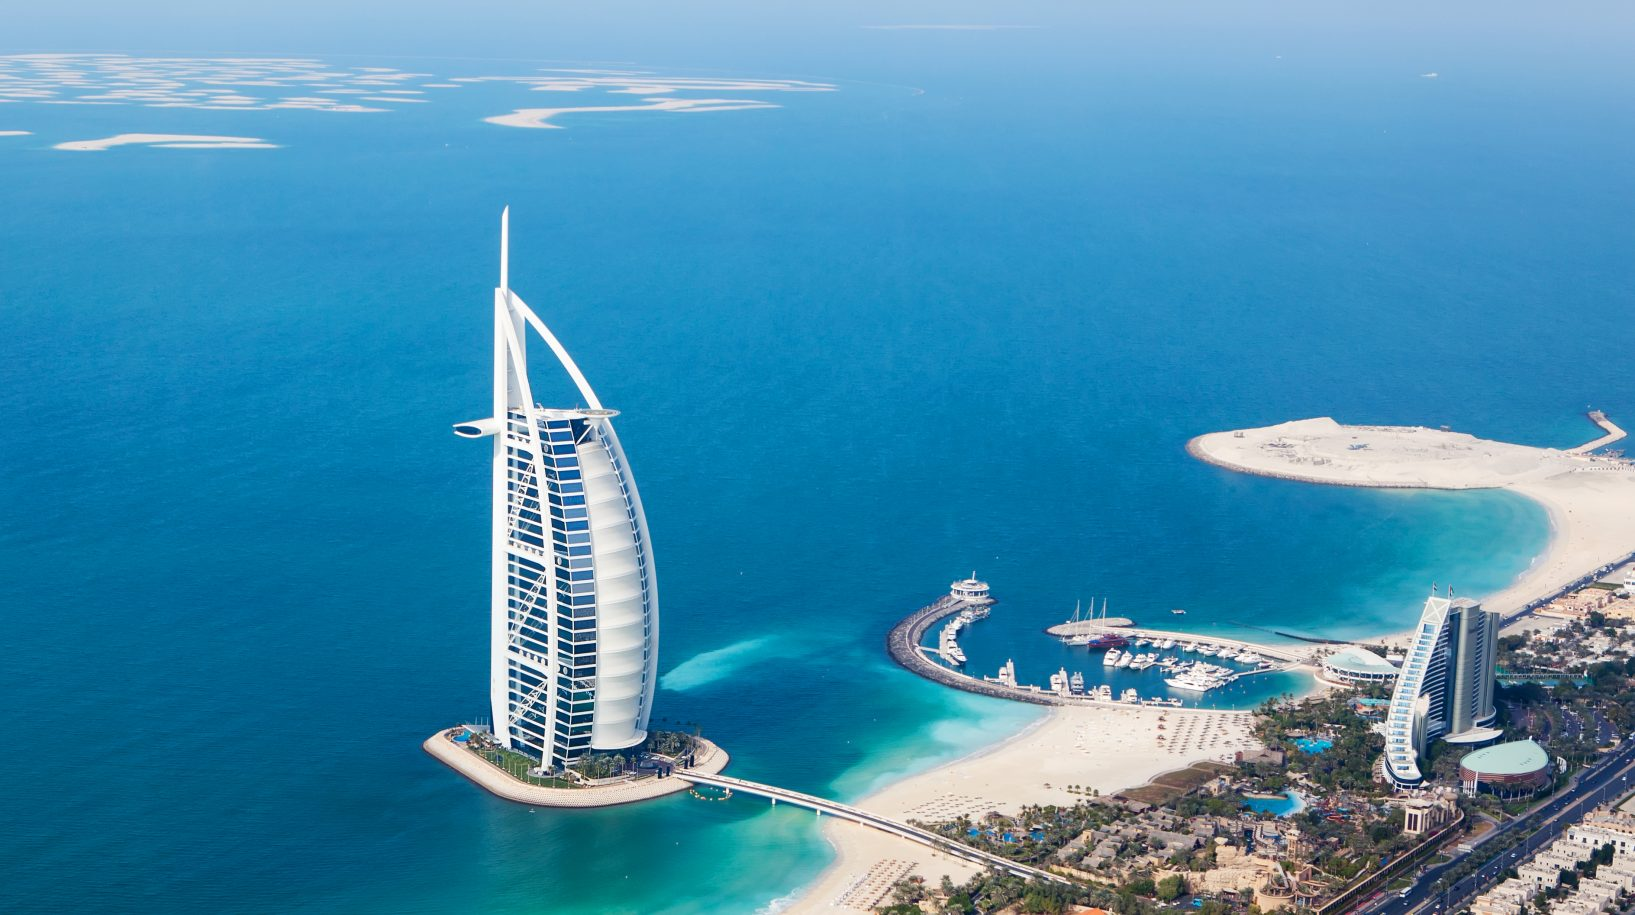 United Arab Emirates Dubai Abu Dhabi Gulf Of Oman All World Journeys